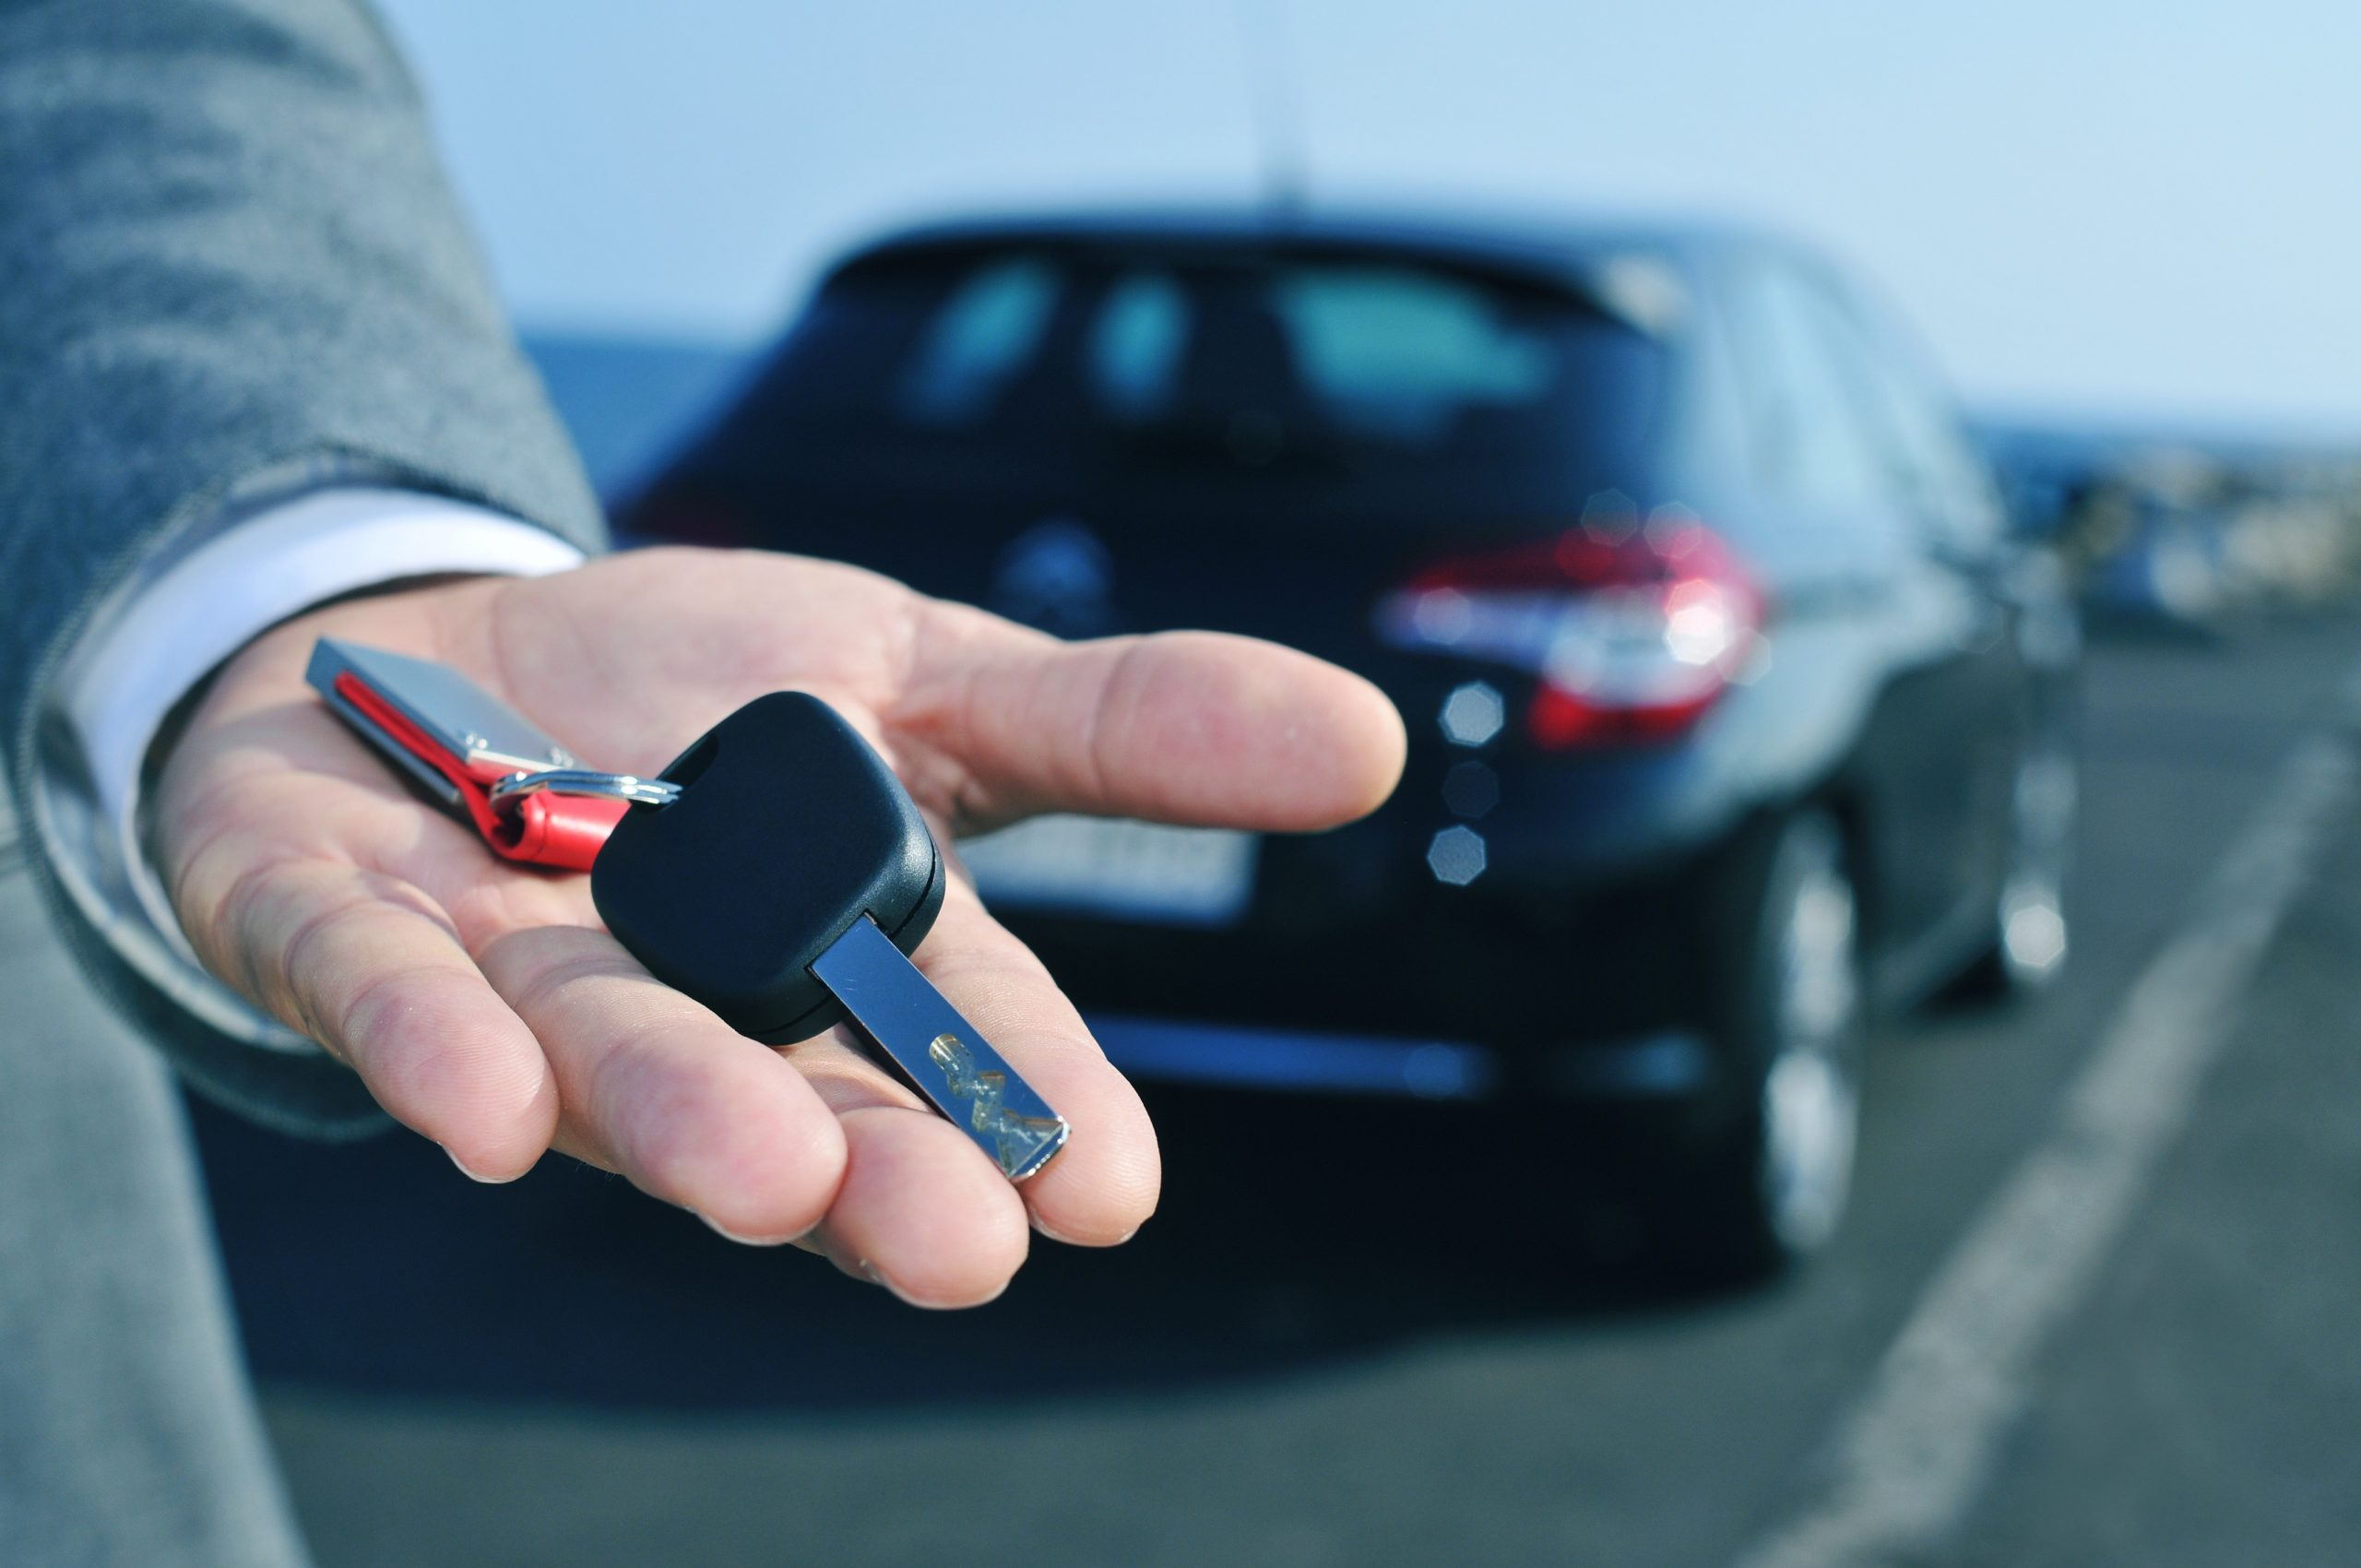 Nelson car rental companies